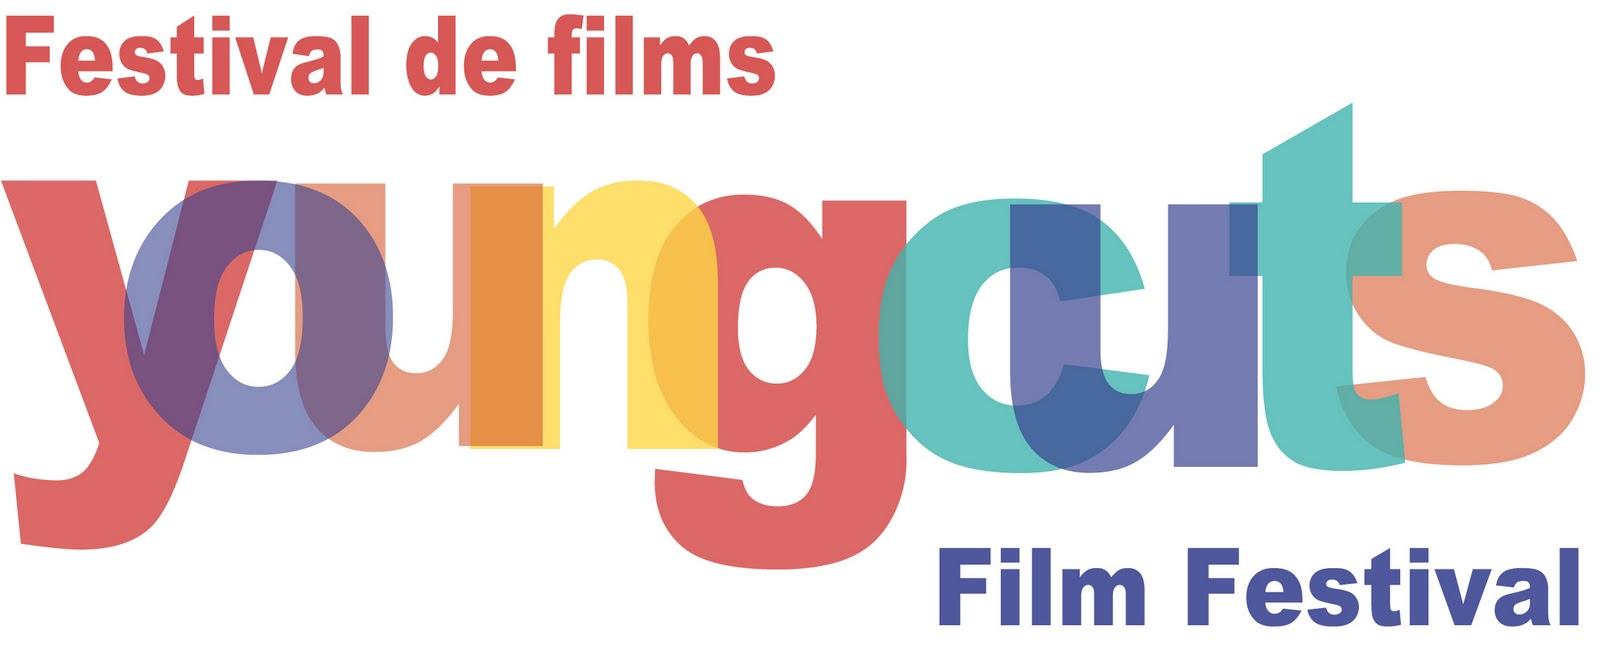 LA Production Company Tiger House Films Agent 6 Youngcuts Film Fest Logo